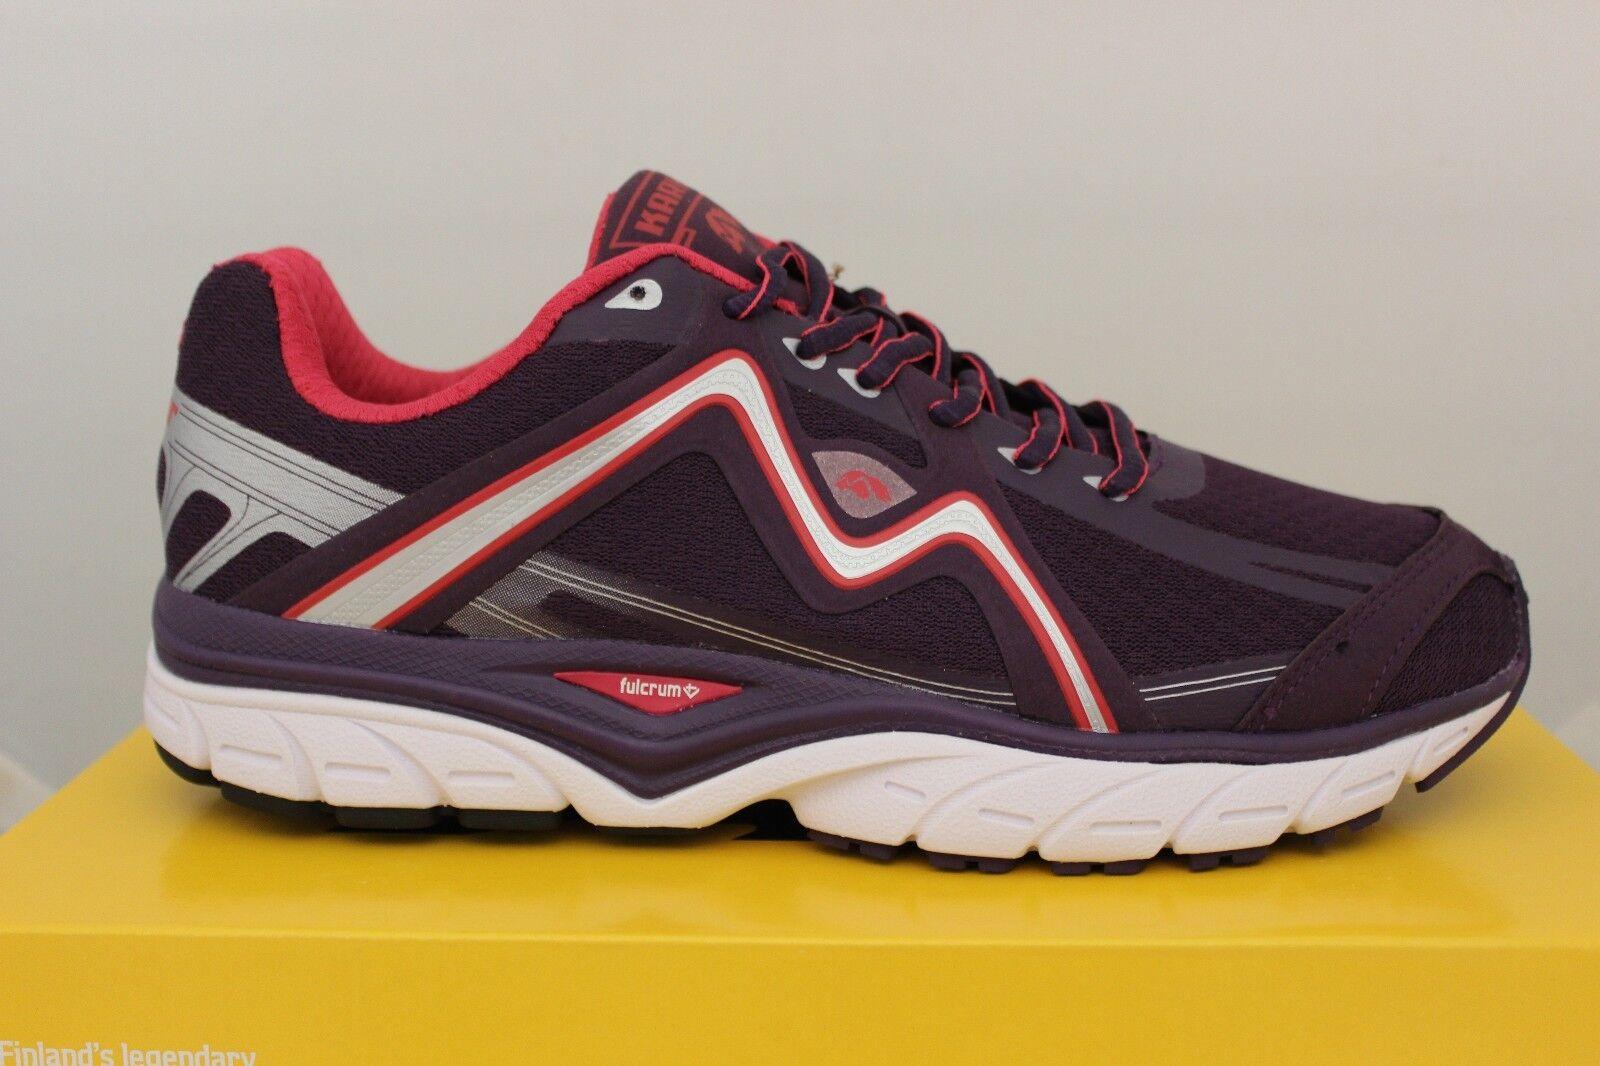 femmes  Karhu Strong5 Running  Chaussures  Plum/Hibiscus F200135 Brand New!!!